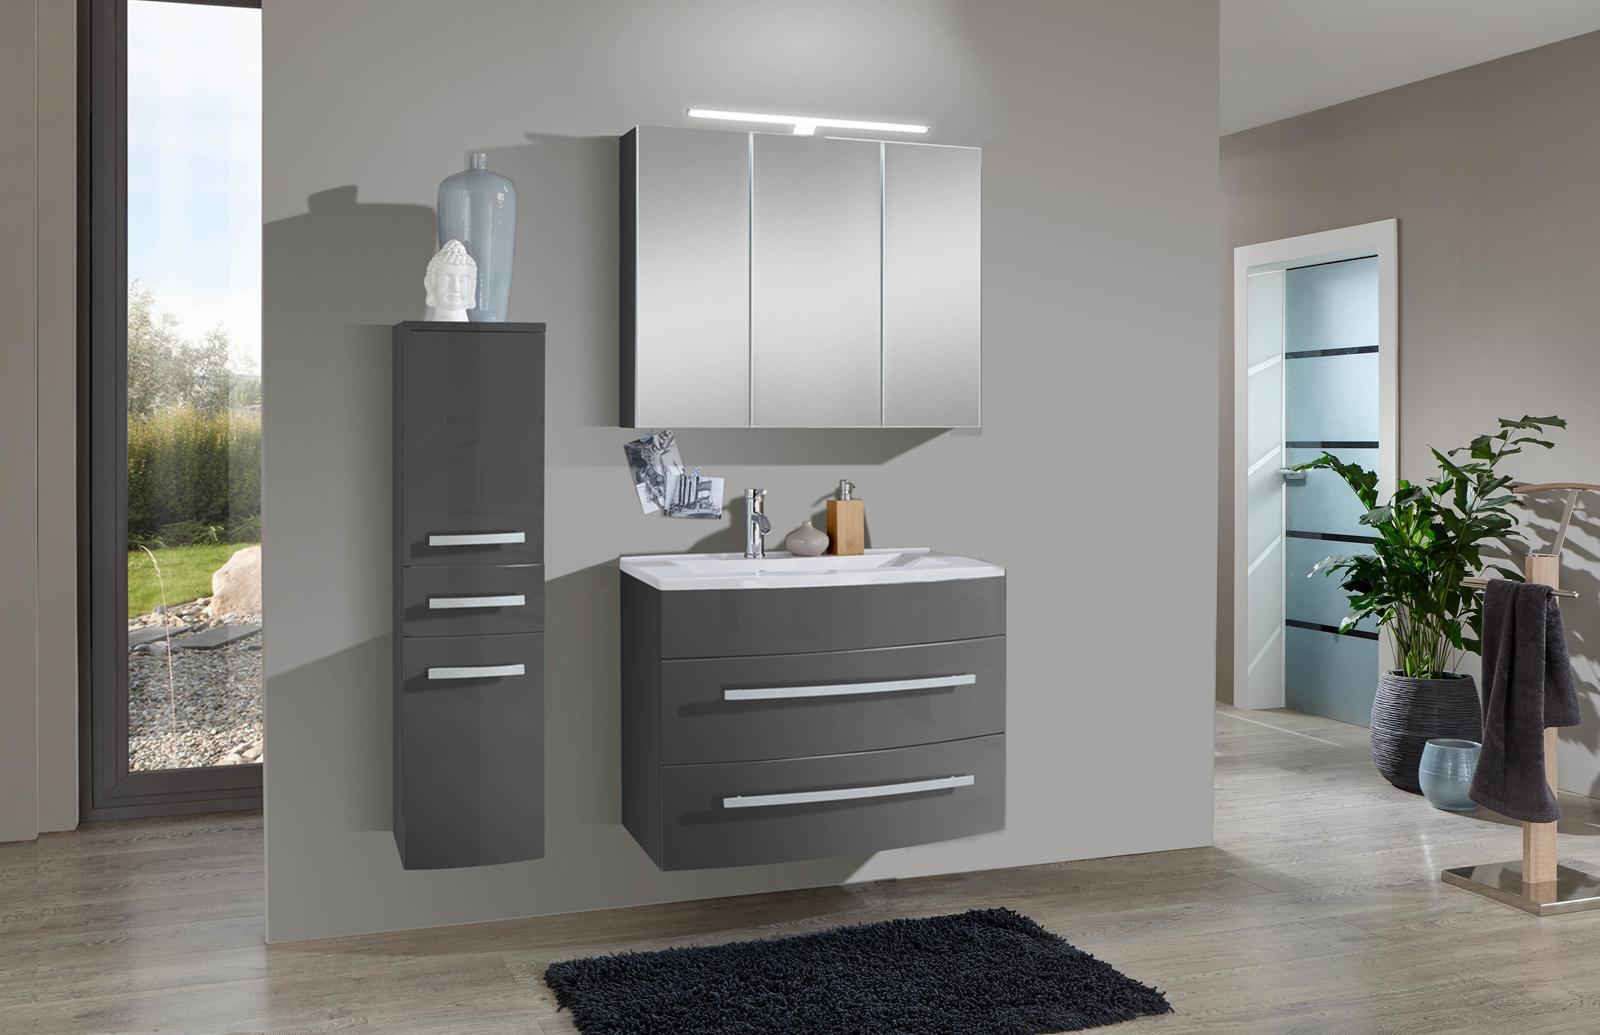 sam 3tlg badezimmer set hochglanz grau 70cm genf auf lager. Black Bedroom Furniture Sets. Home Design Ideas